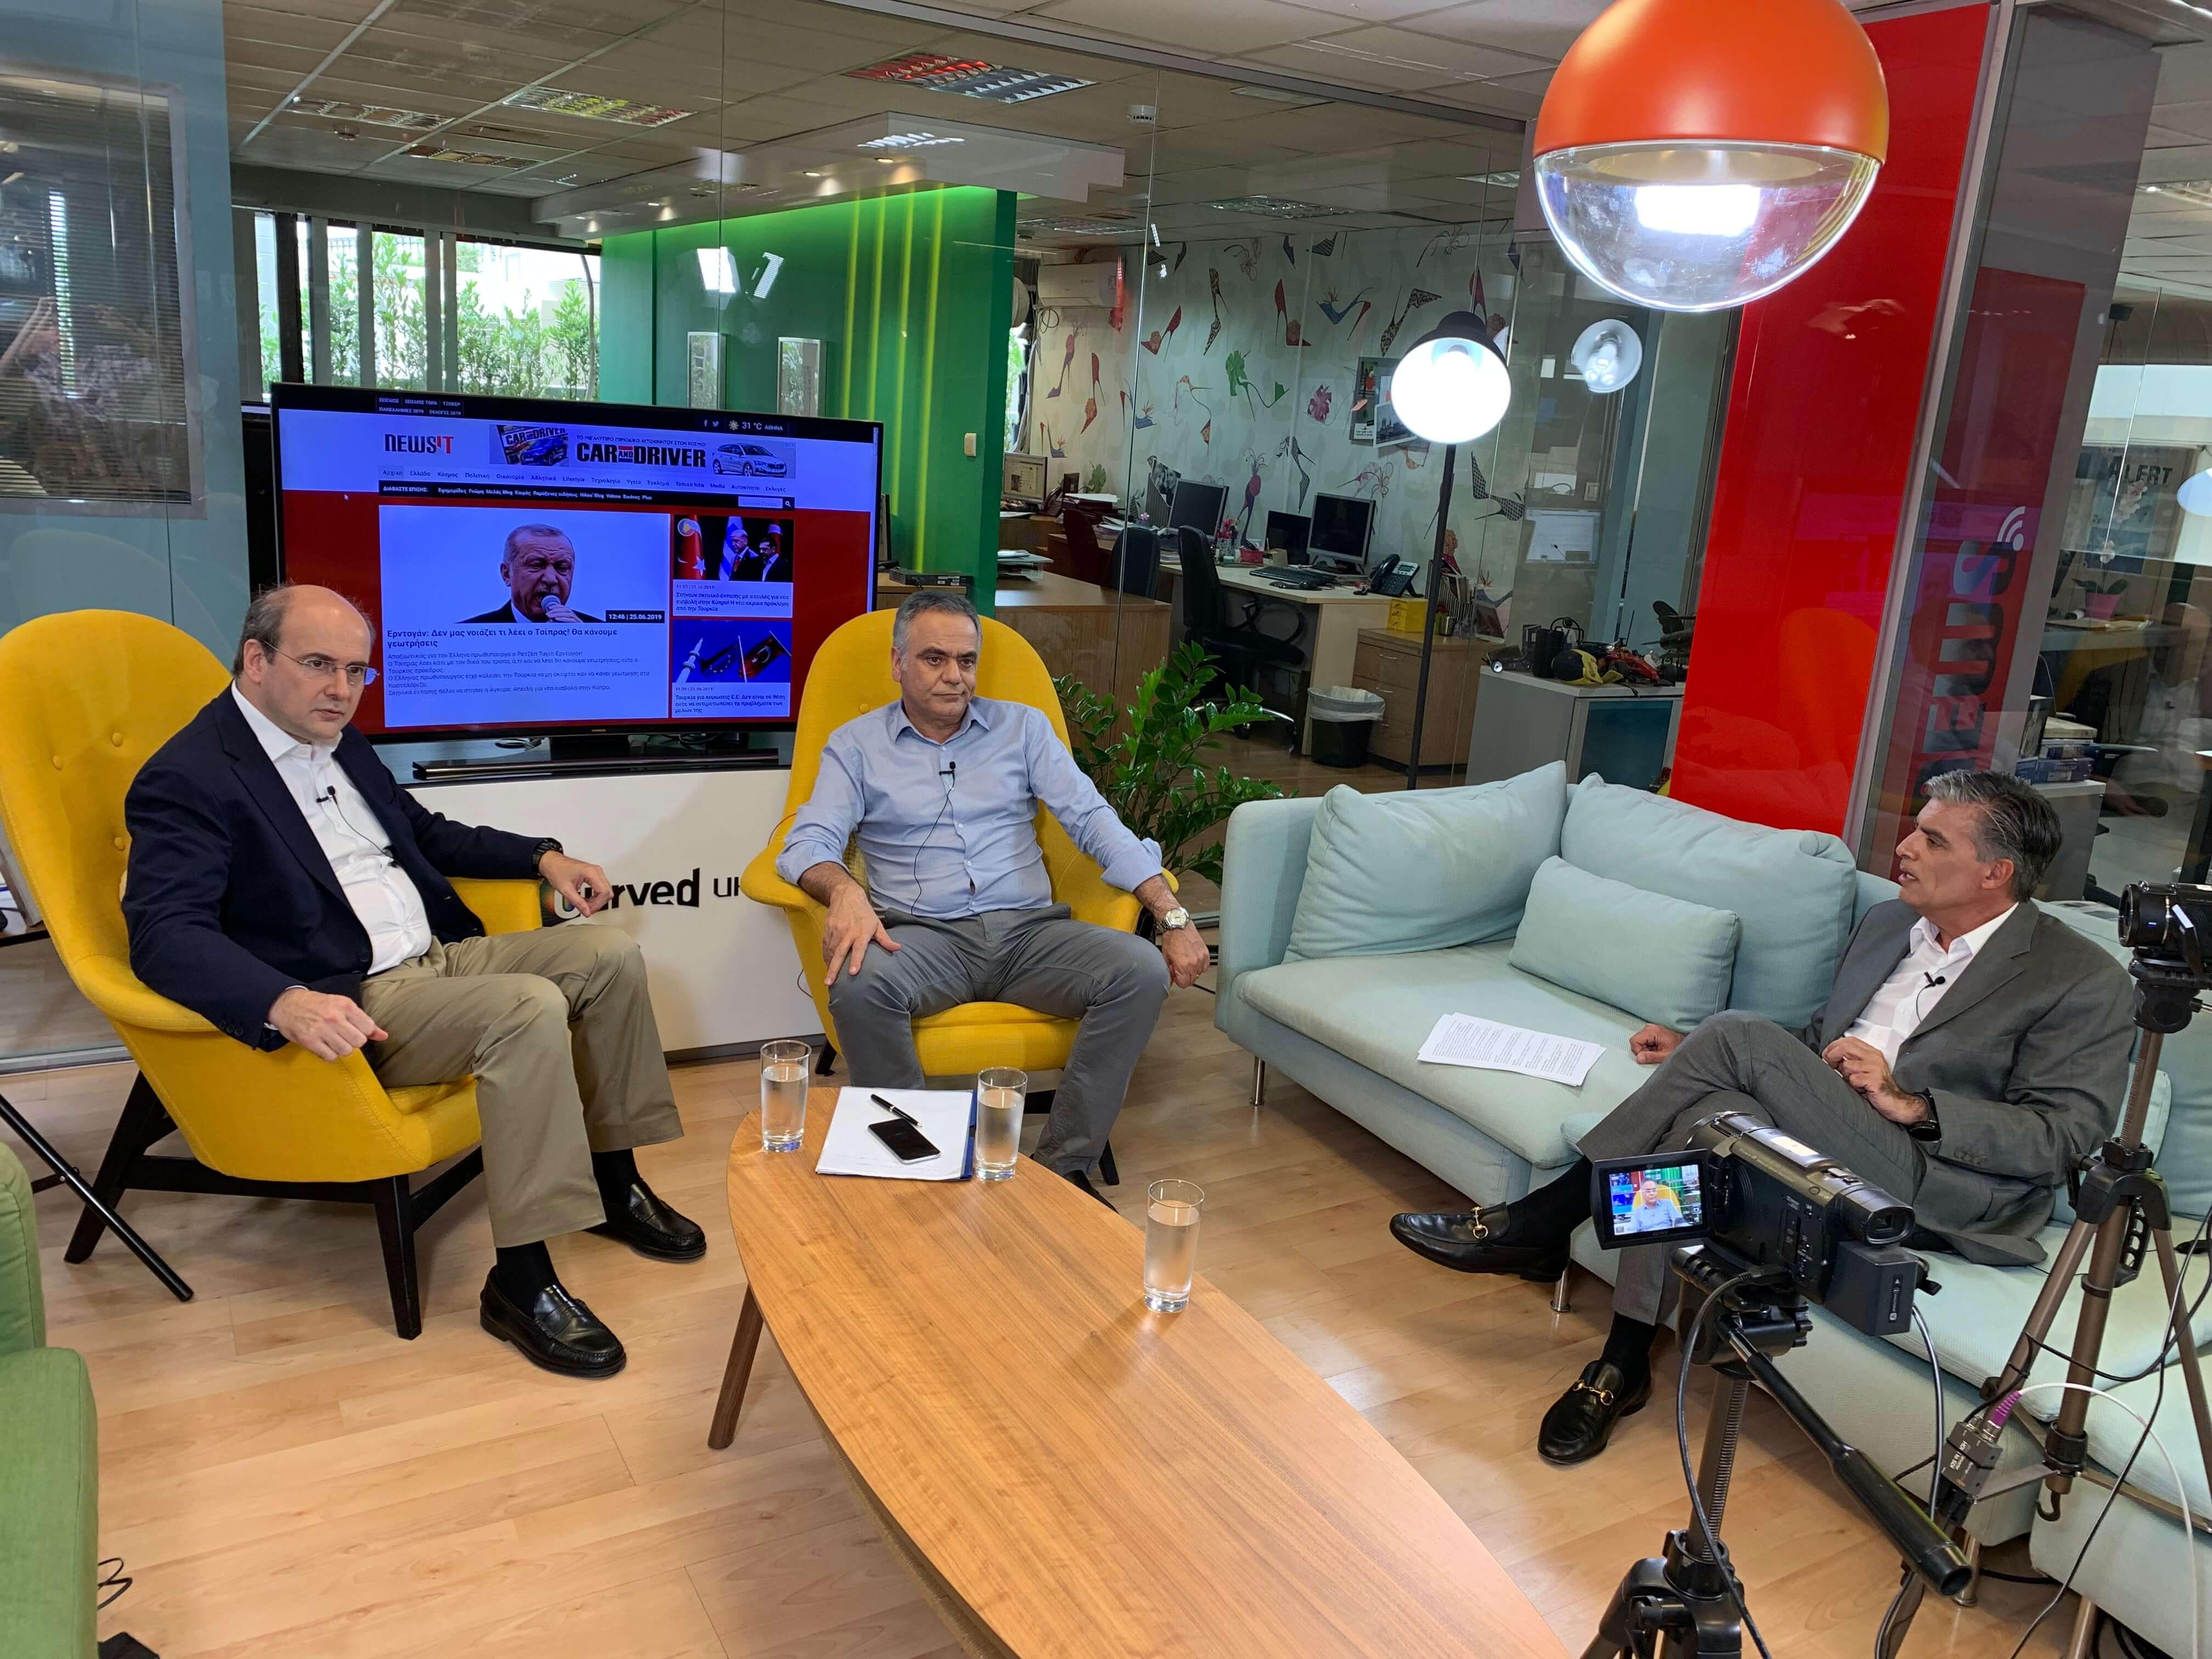 Debate στο newsit.gr: Πάνος Σκουρλέτης εναντίον Κωστή Χατζηδάκη